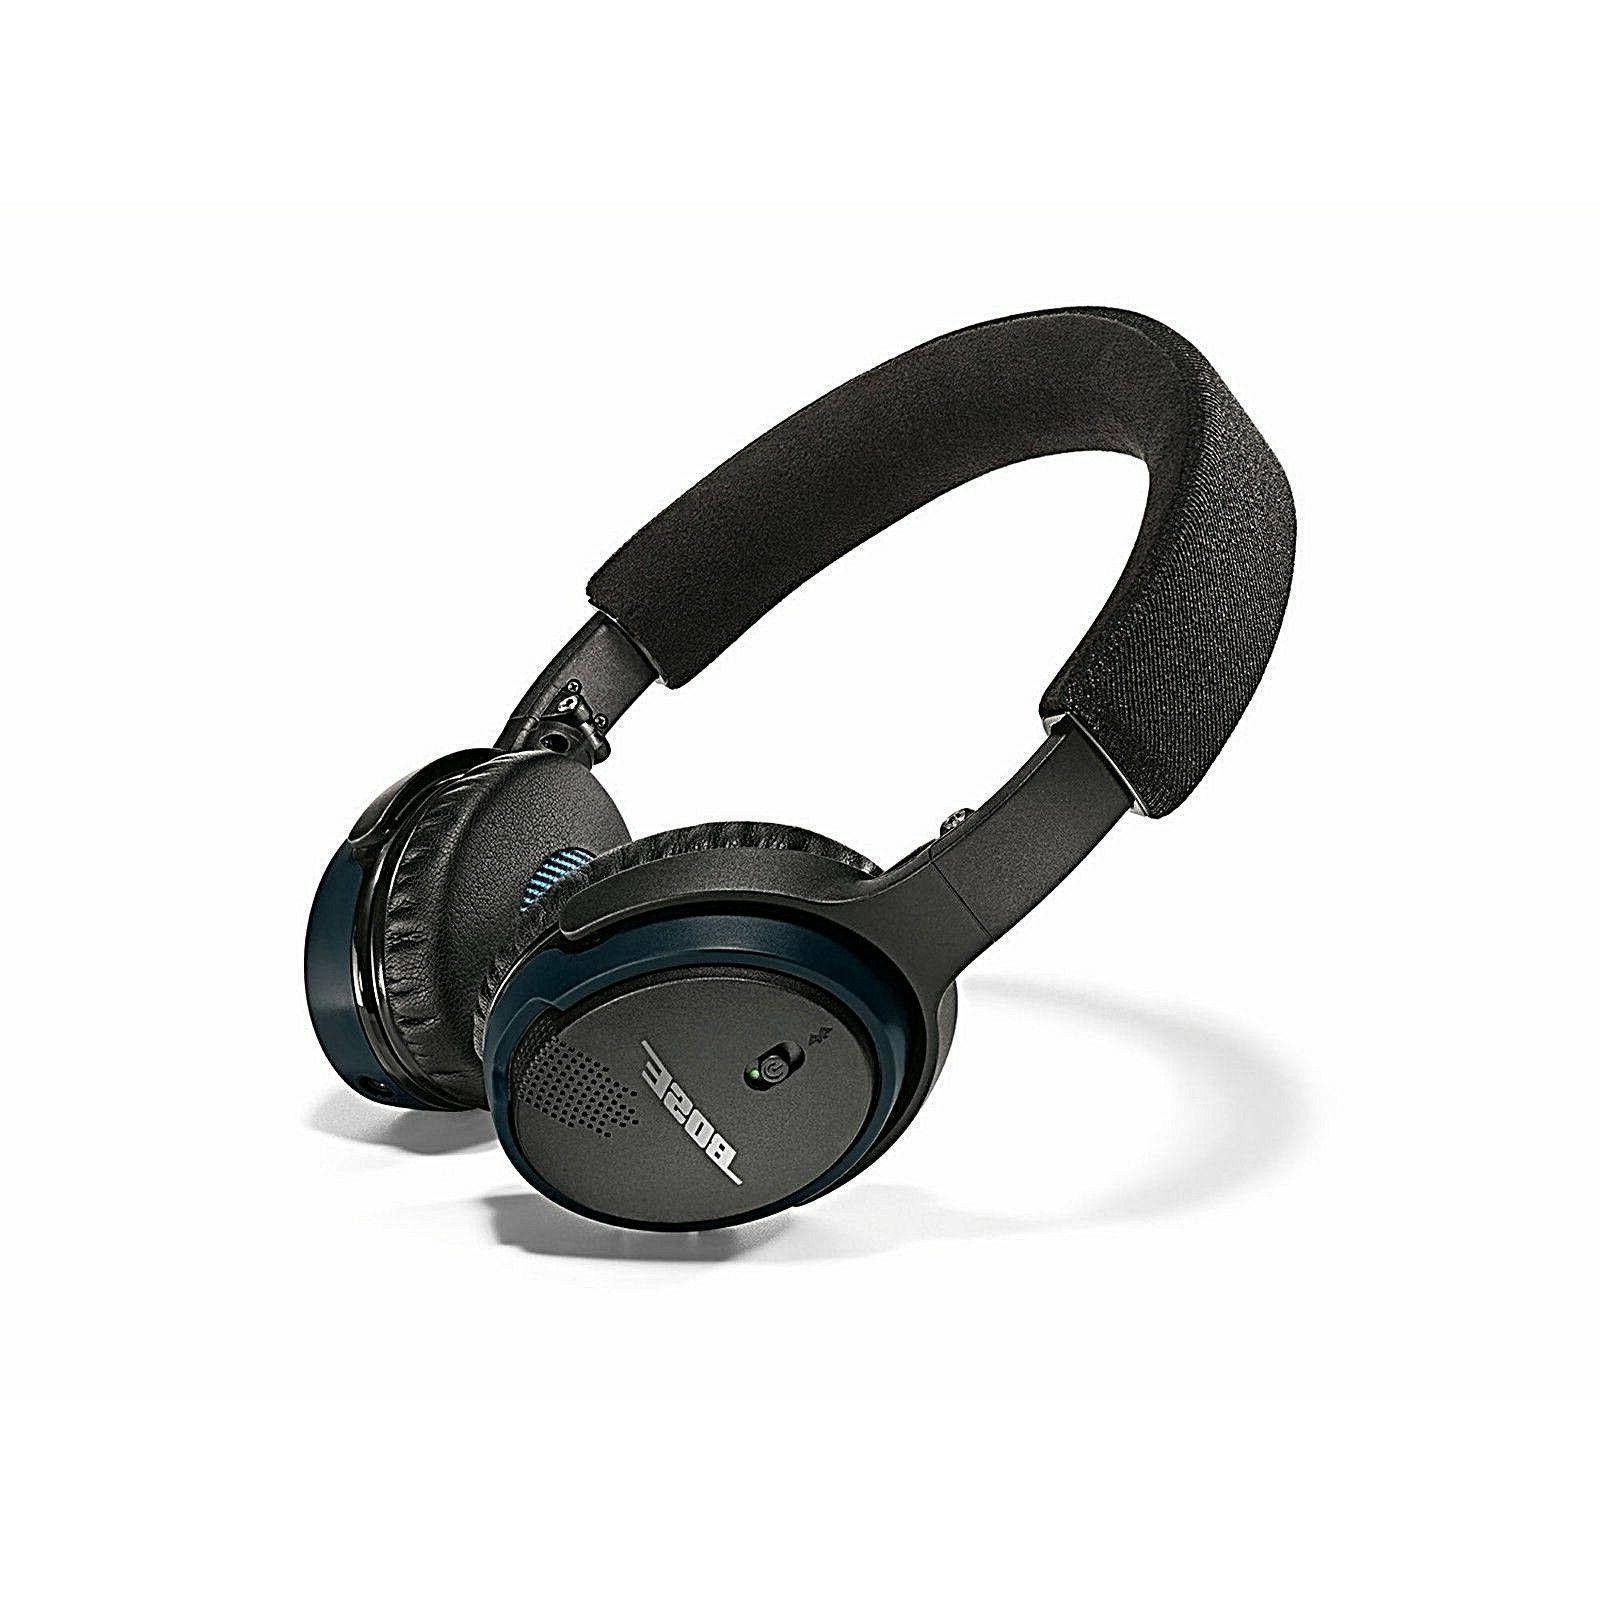 Bose Soundlink On Ear Bluetooth Wireless Headphones Black